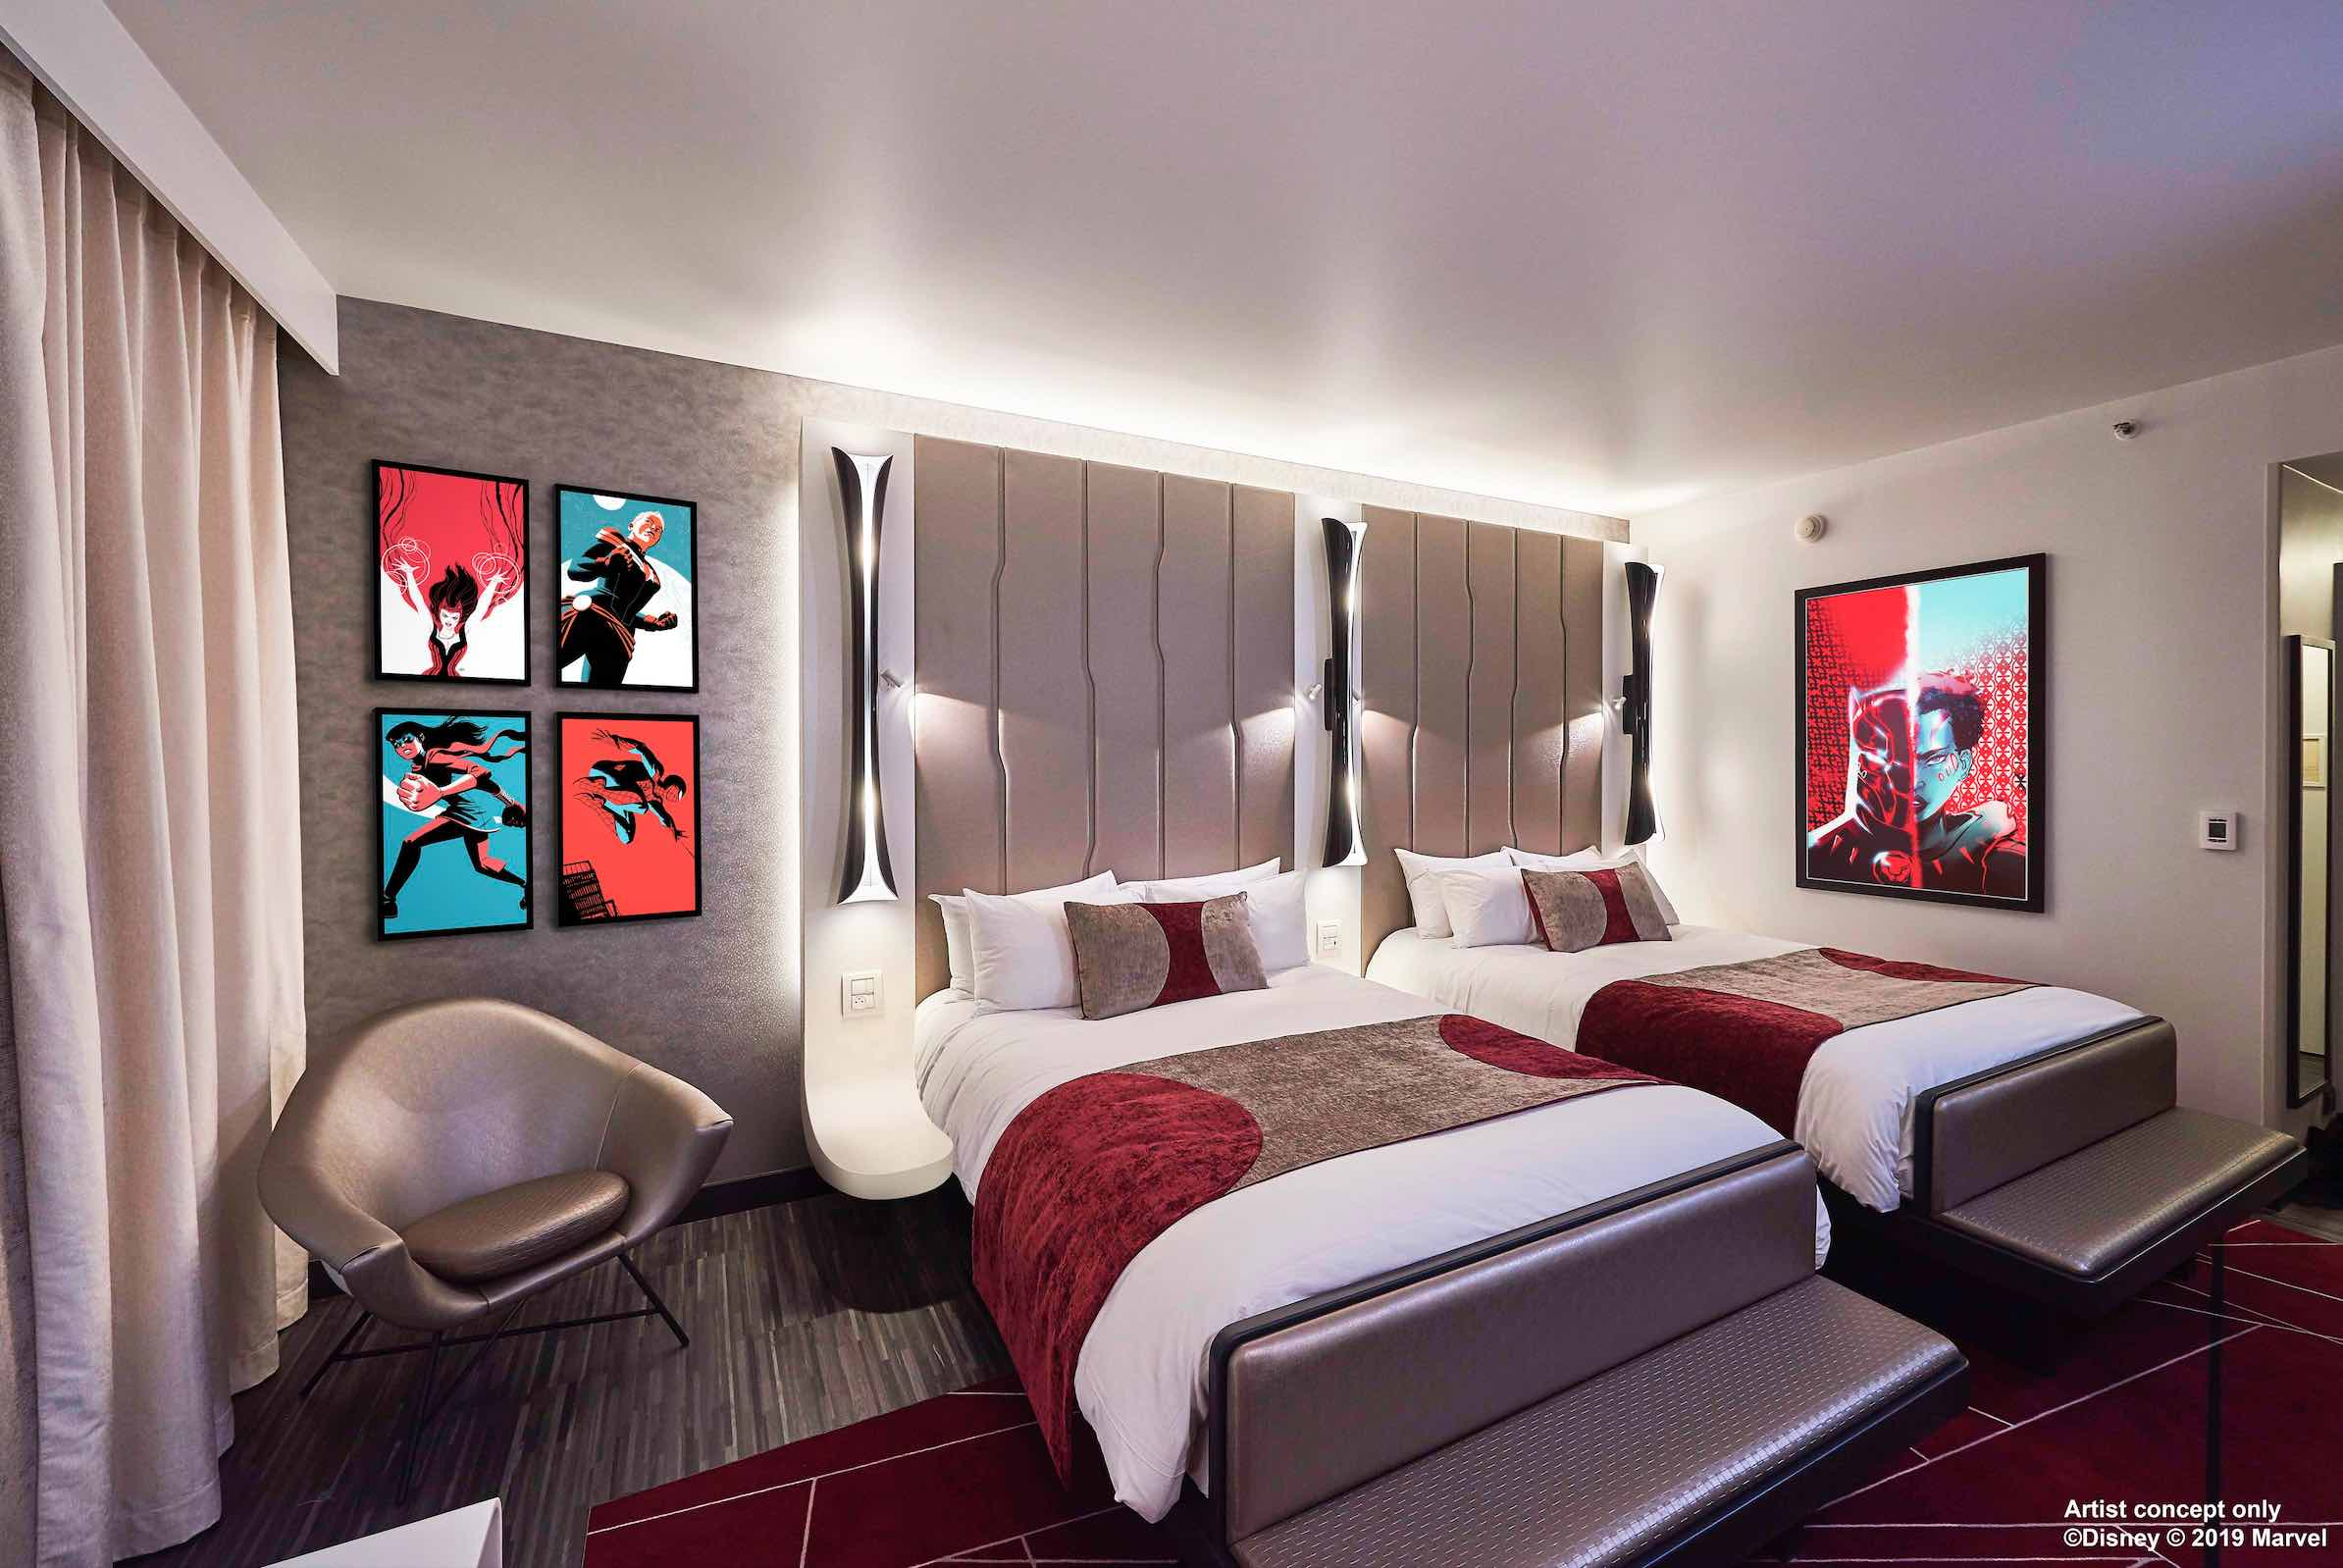 Disney's Hotel New Yorkt